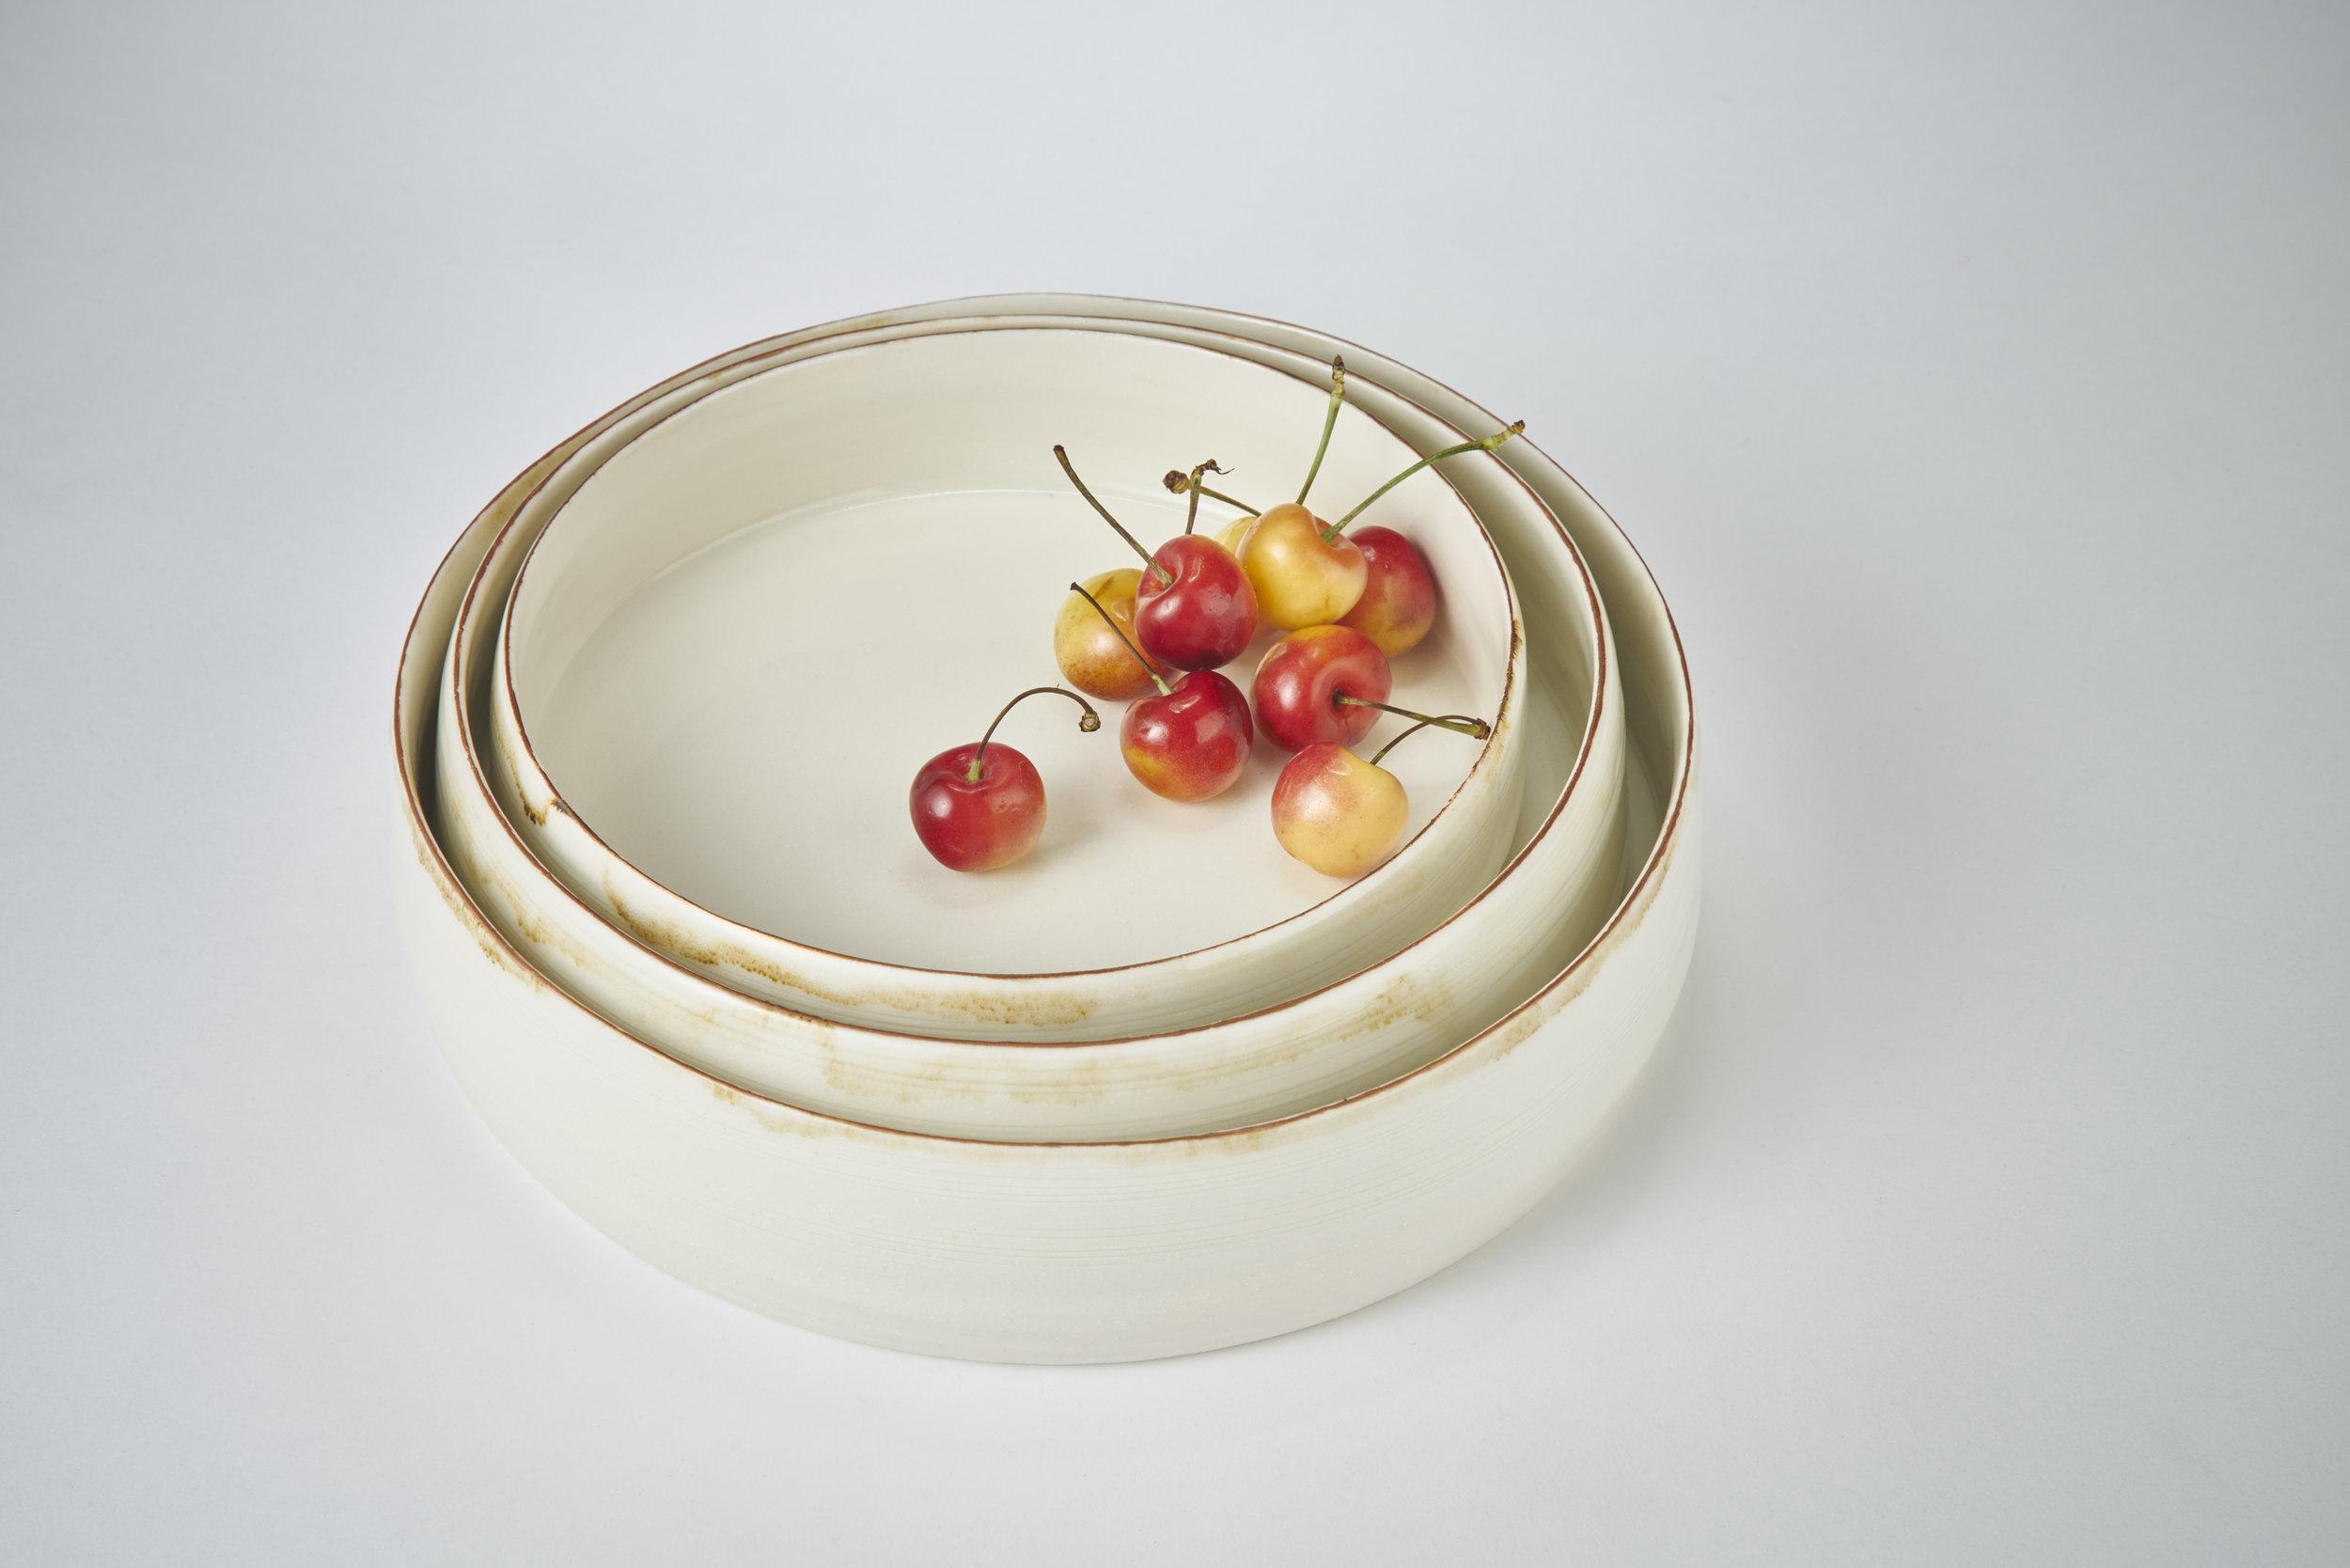 K Adams Ceramics nest of bowls with bronze lustre rim small 20cm x 5cm, medium 22cm x 5.5cm, large 25.5cm x 6cm. Photography Matthew Booth.jpg